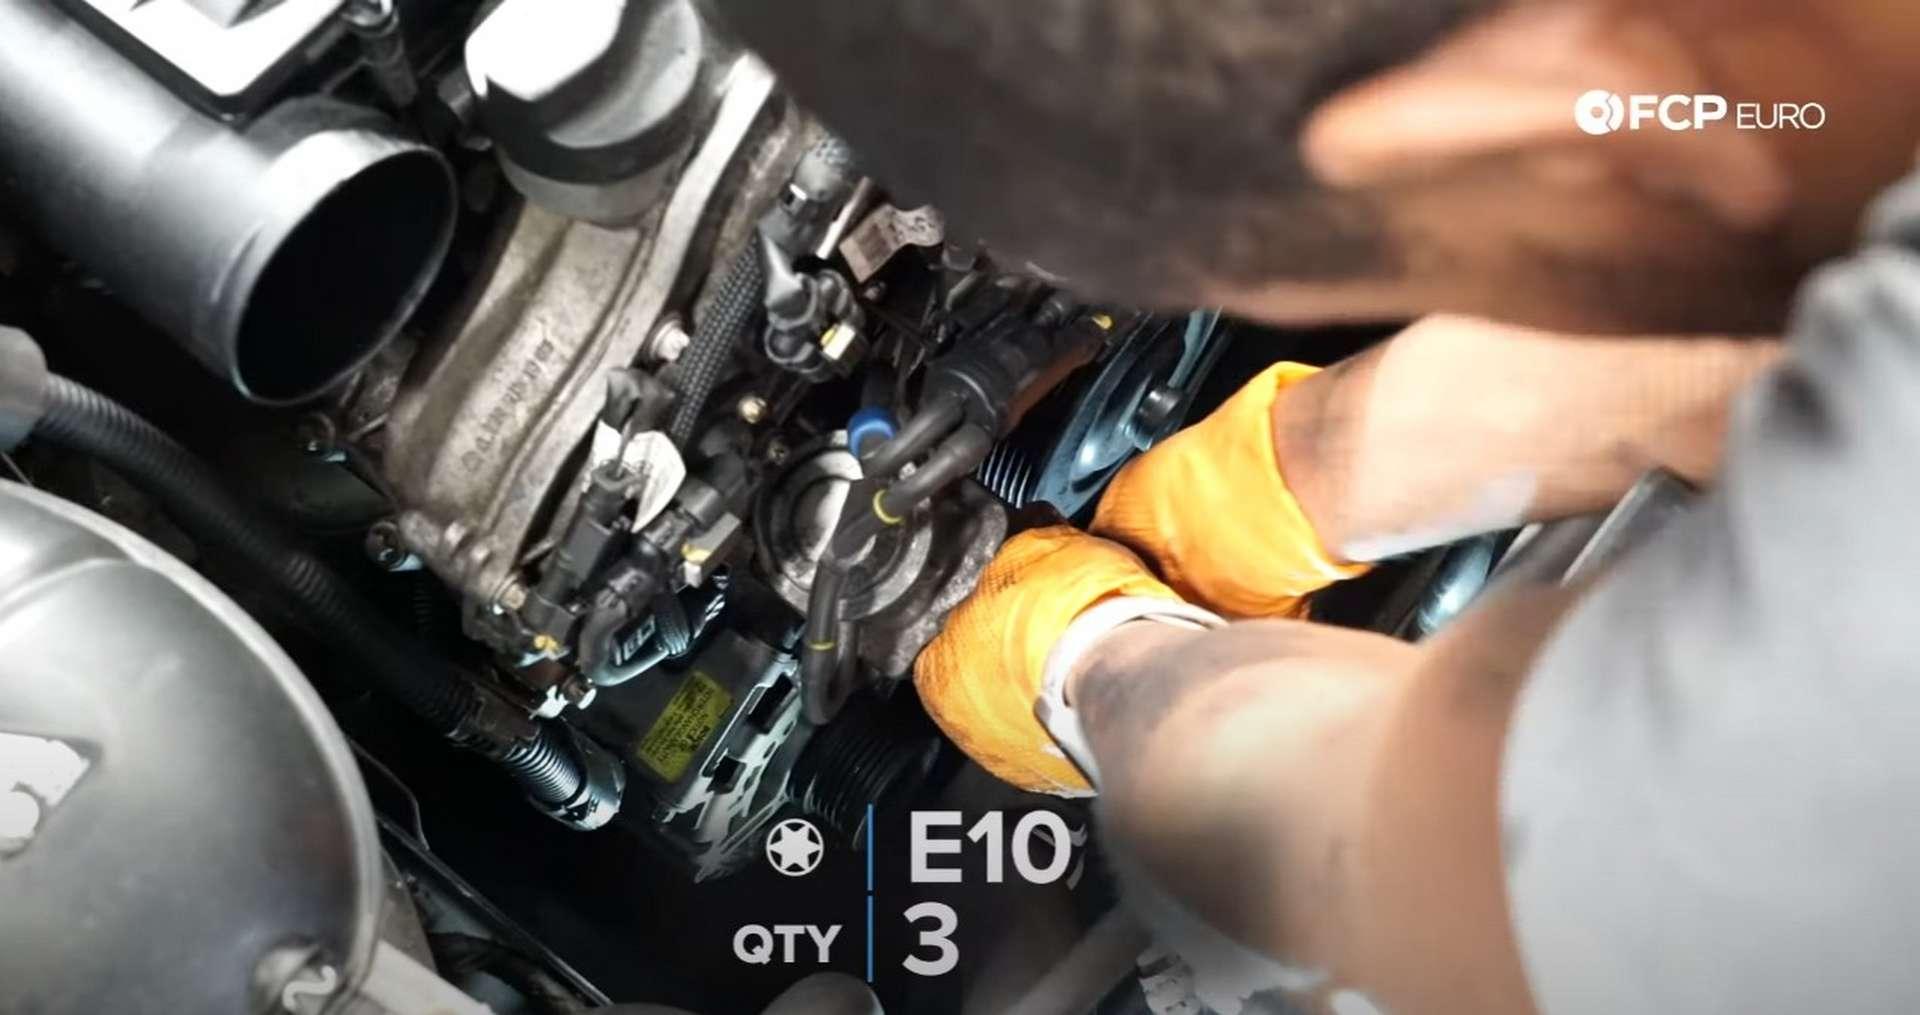 DIY Mercedes W212/204 Alternator and Drive Belt Replacement installing the combi valve